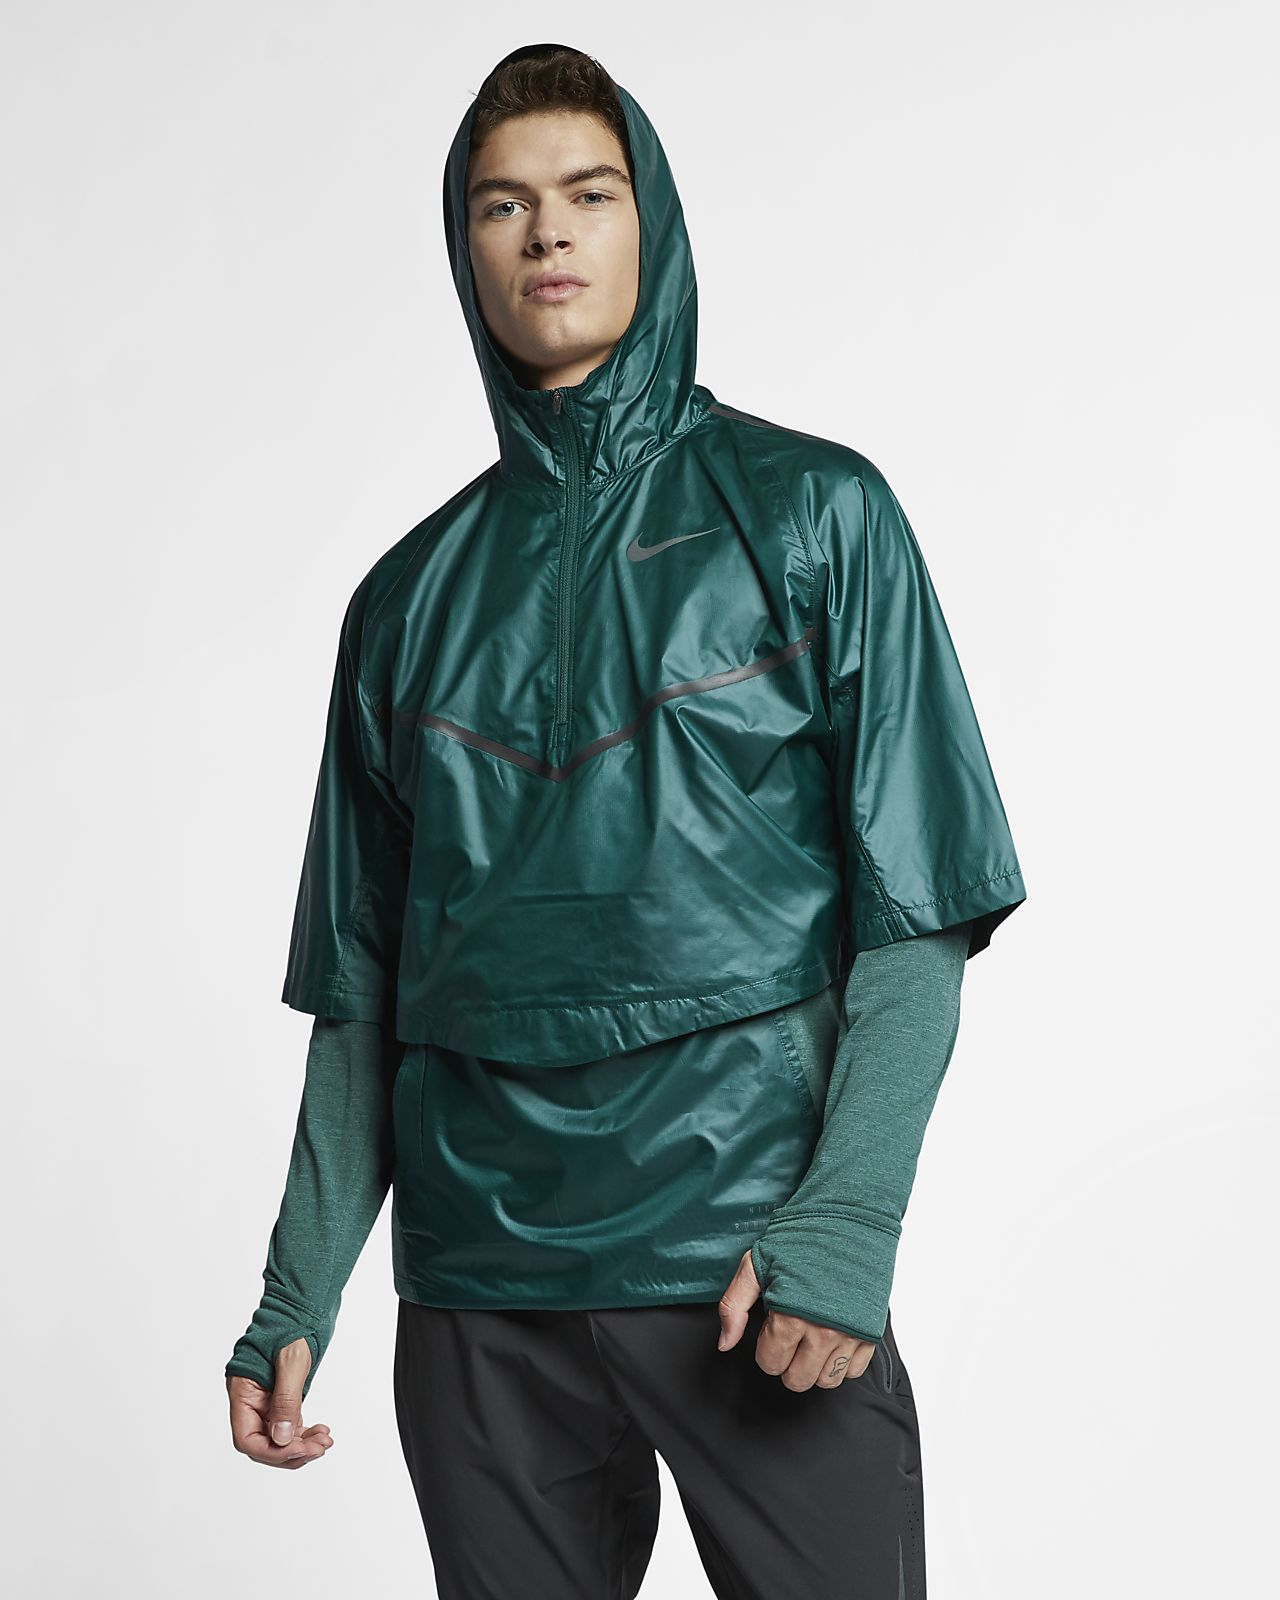 Prenda superior de running para hombre Nike Sphere Transform